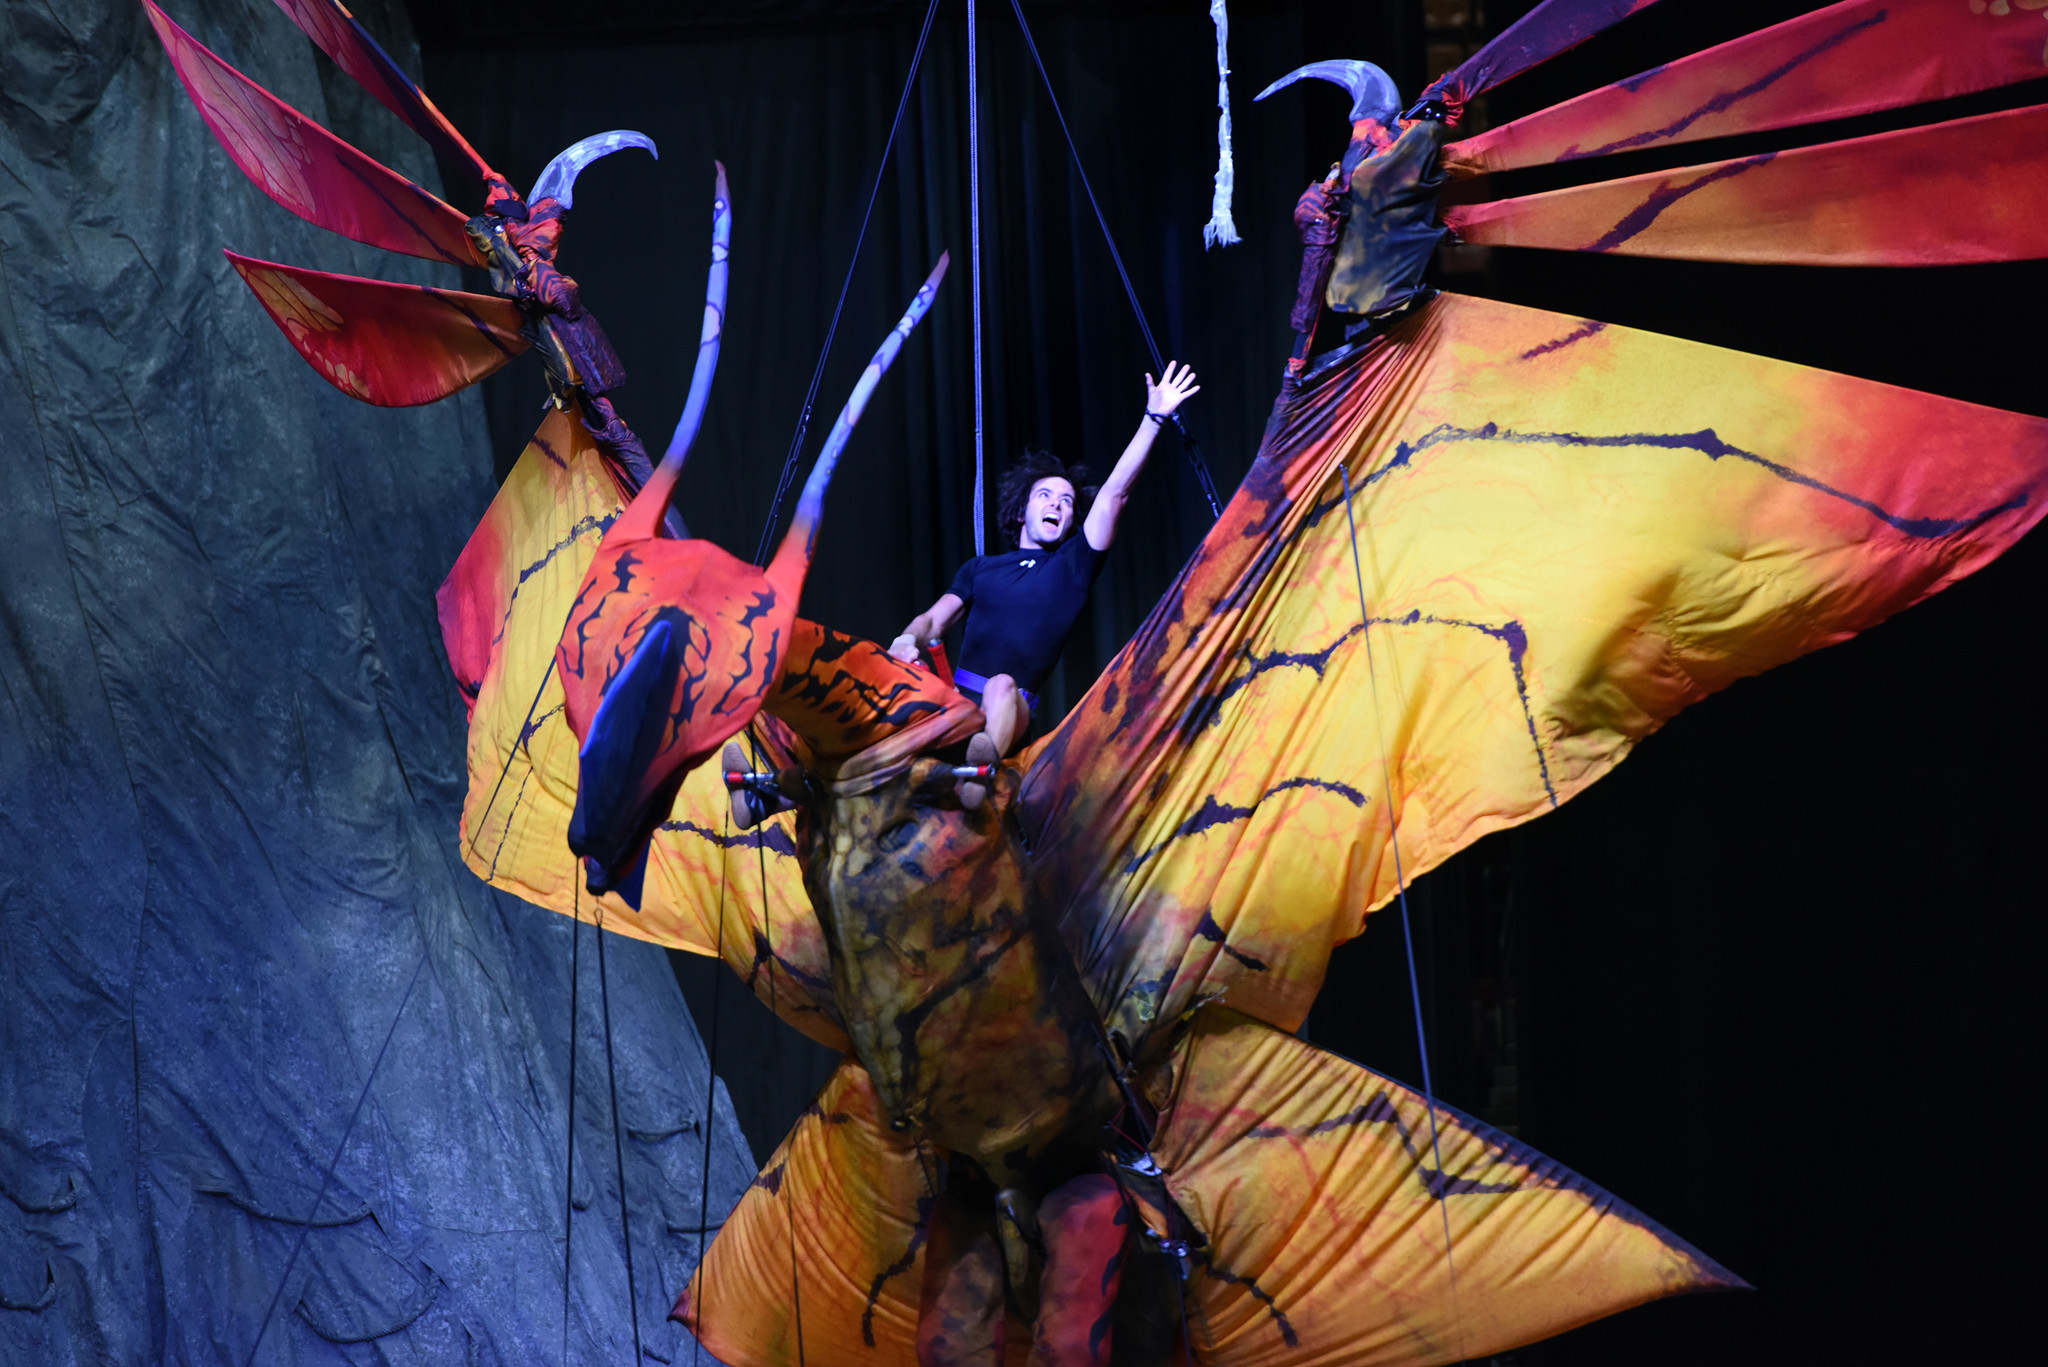 behind-the-scenes of cirque du soleil's toruk - the first flight